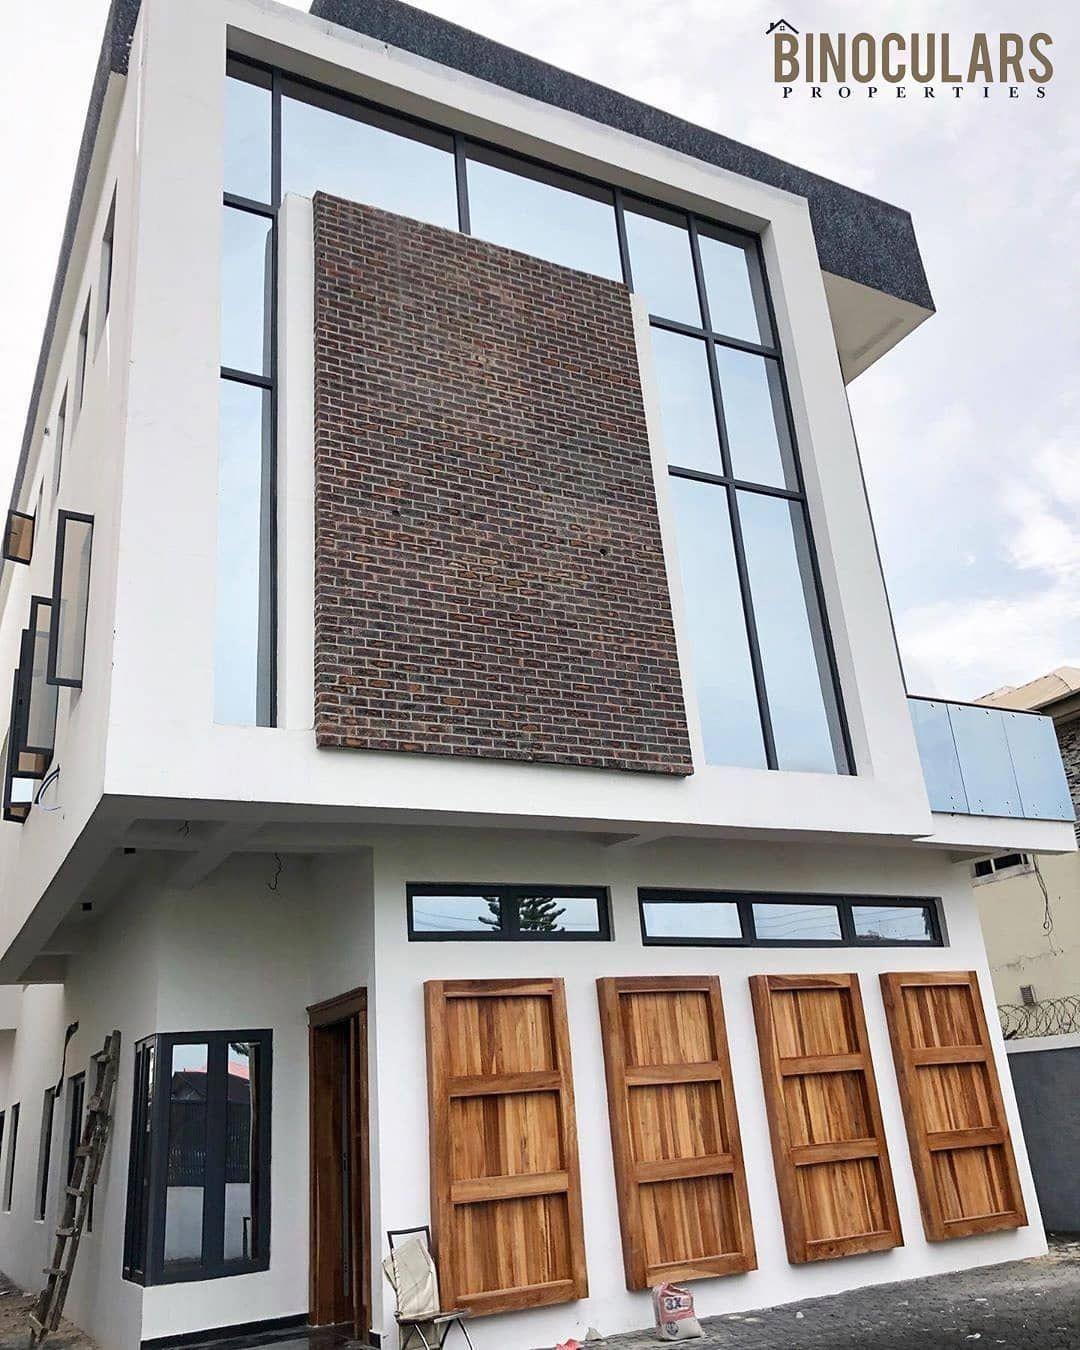 EW LISTING‼️ Lekki Phase 1 Lagos 5 bedroom detached duplex